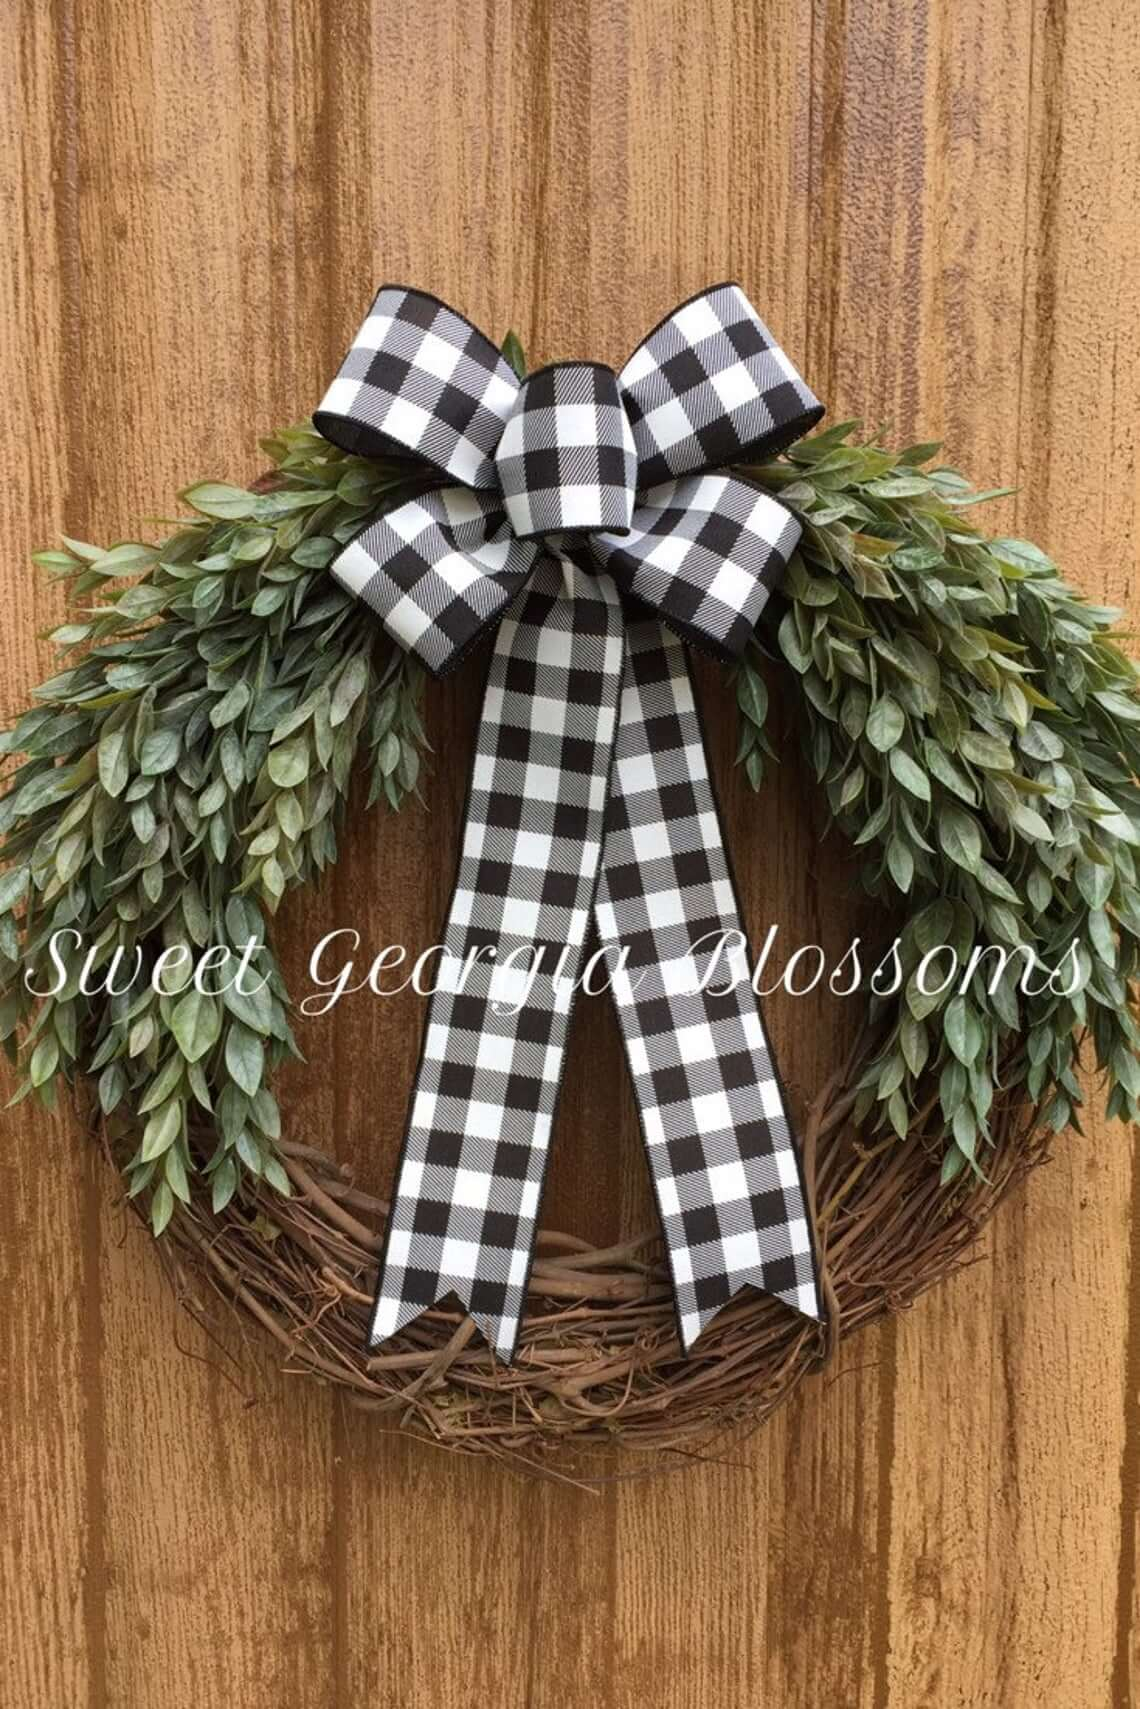 Big Bow Grapevine and Greenery Wreath